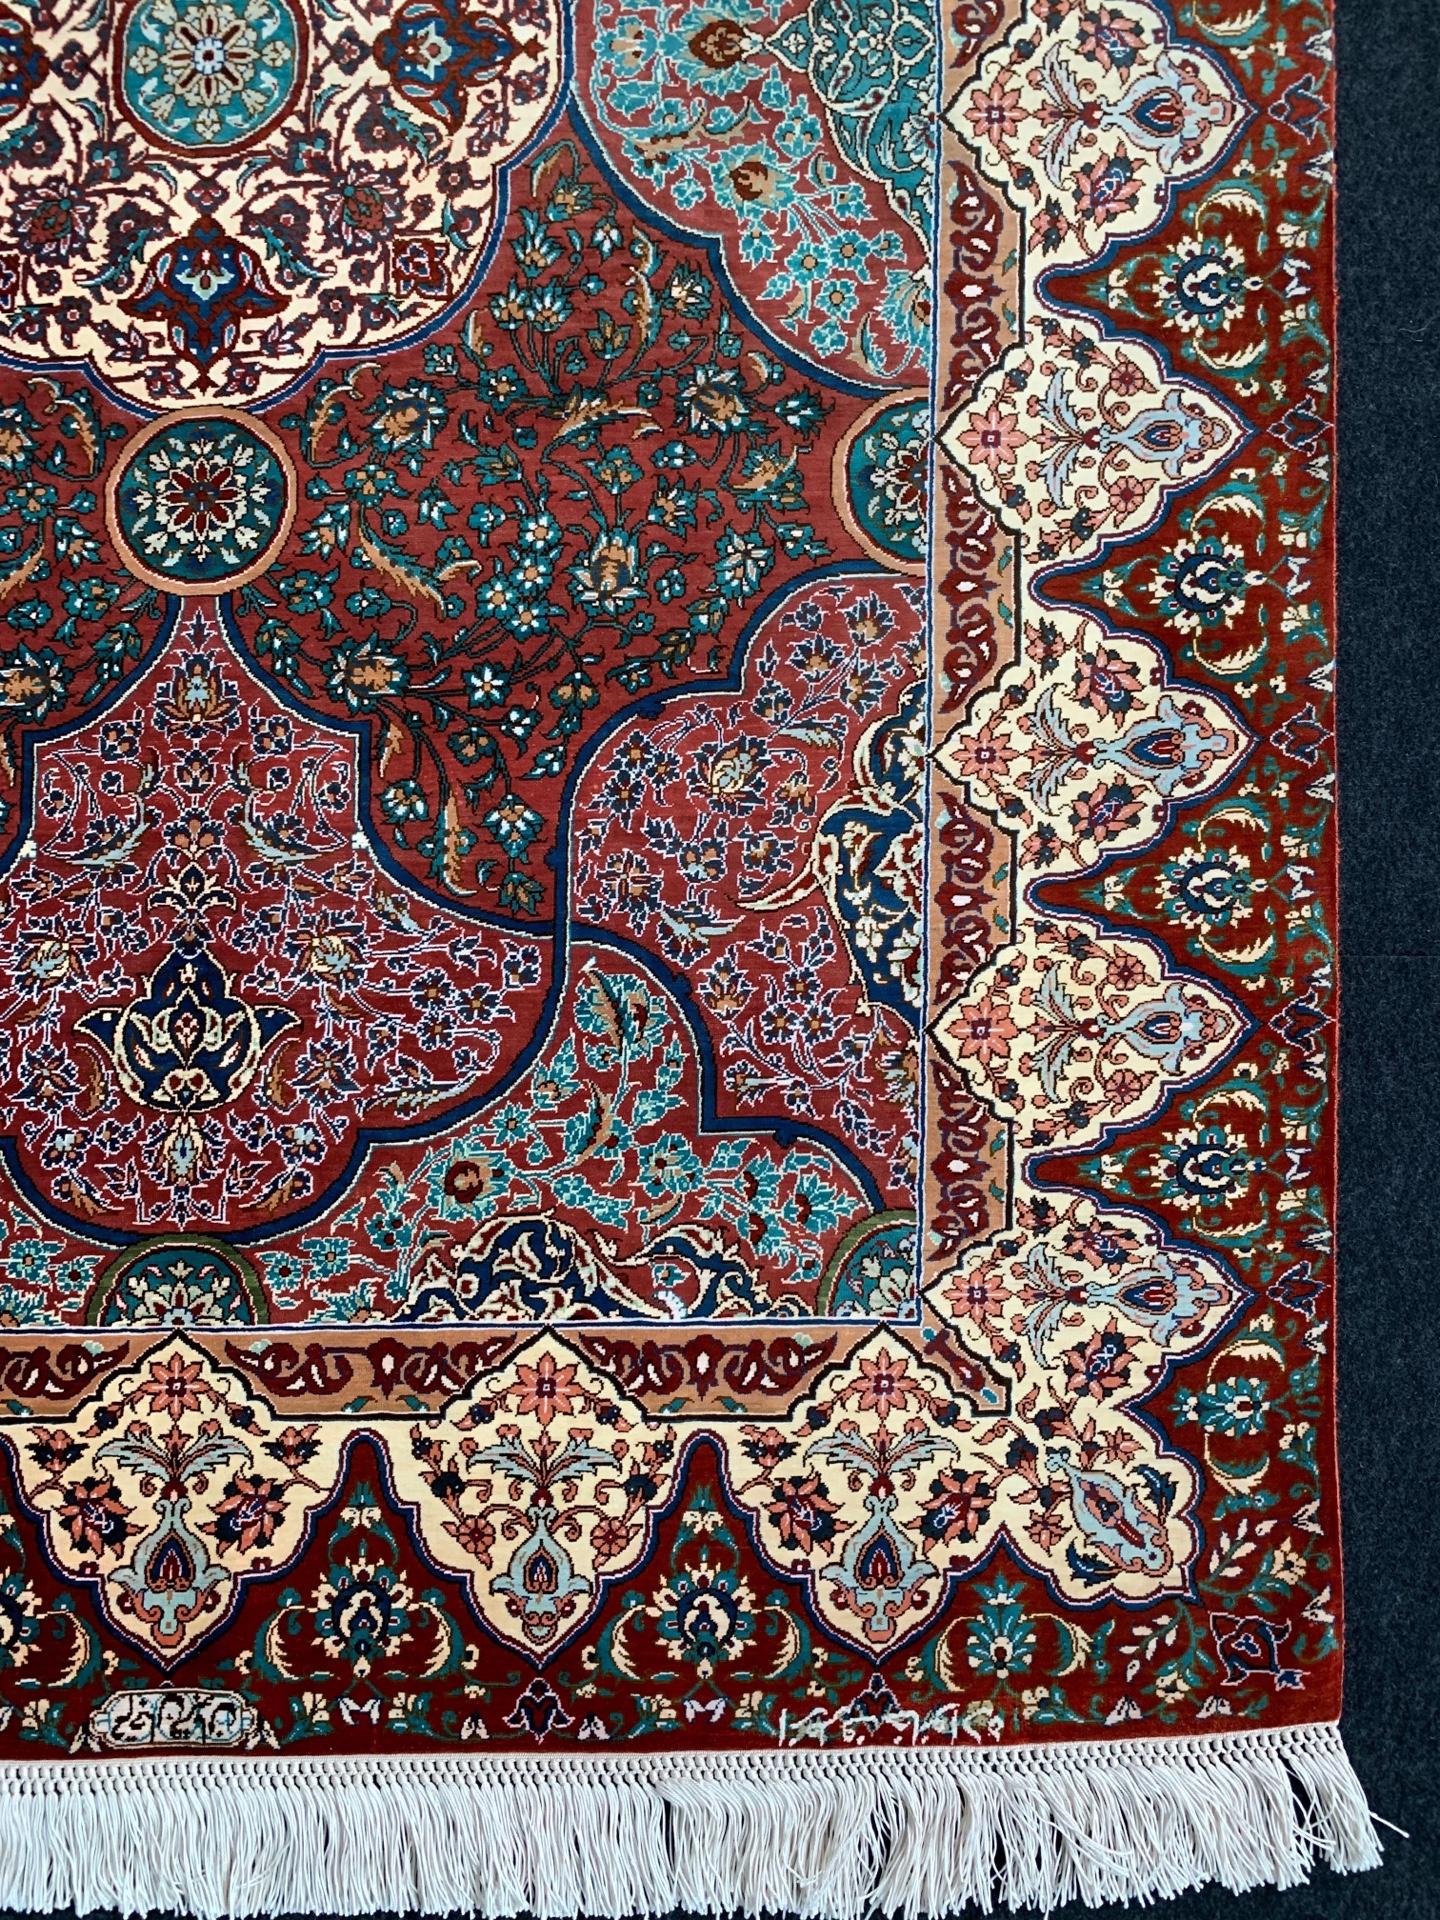 QM7390 クム 手織り ペルシャ絨毯 103×151